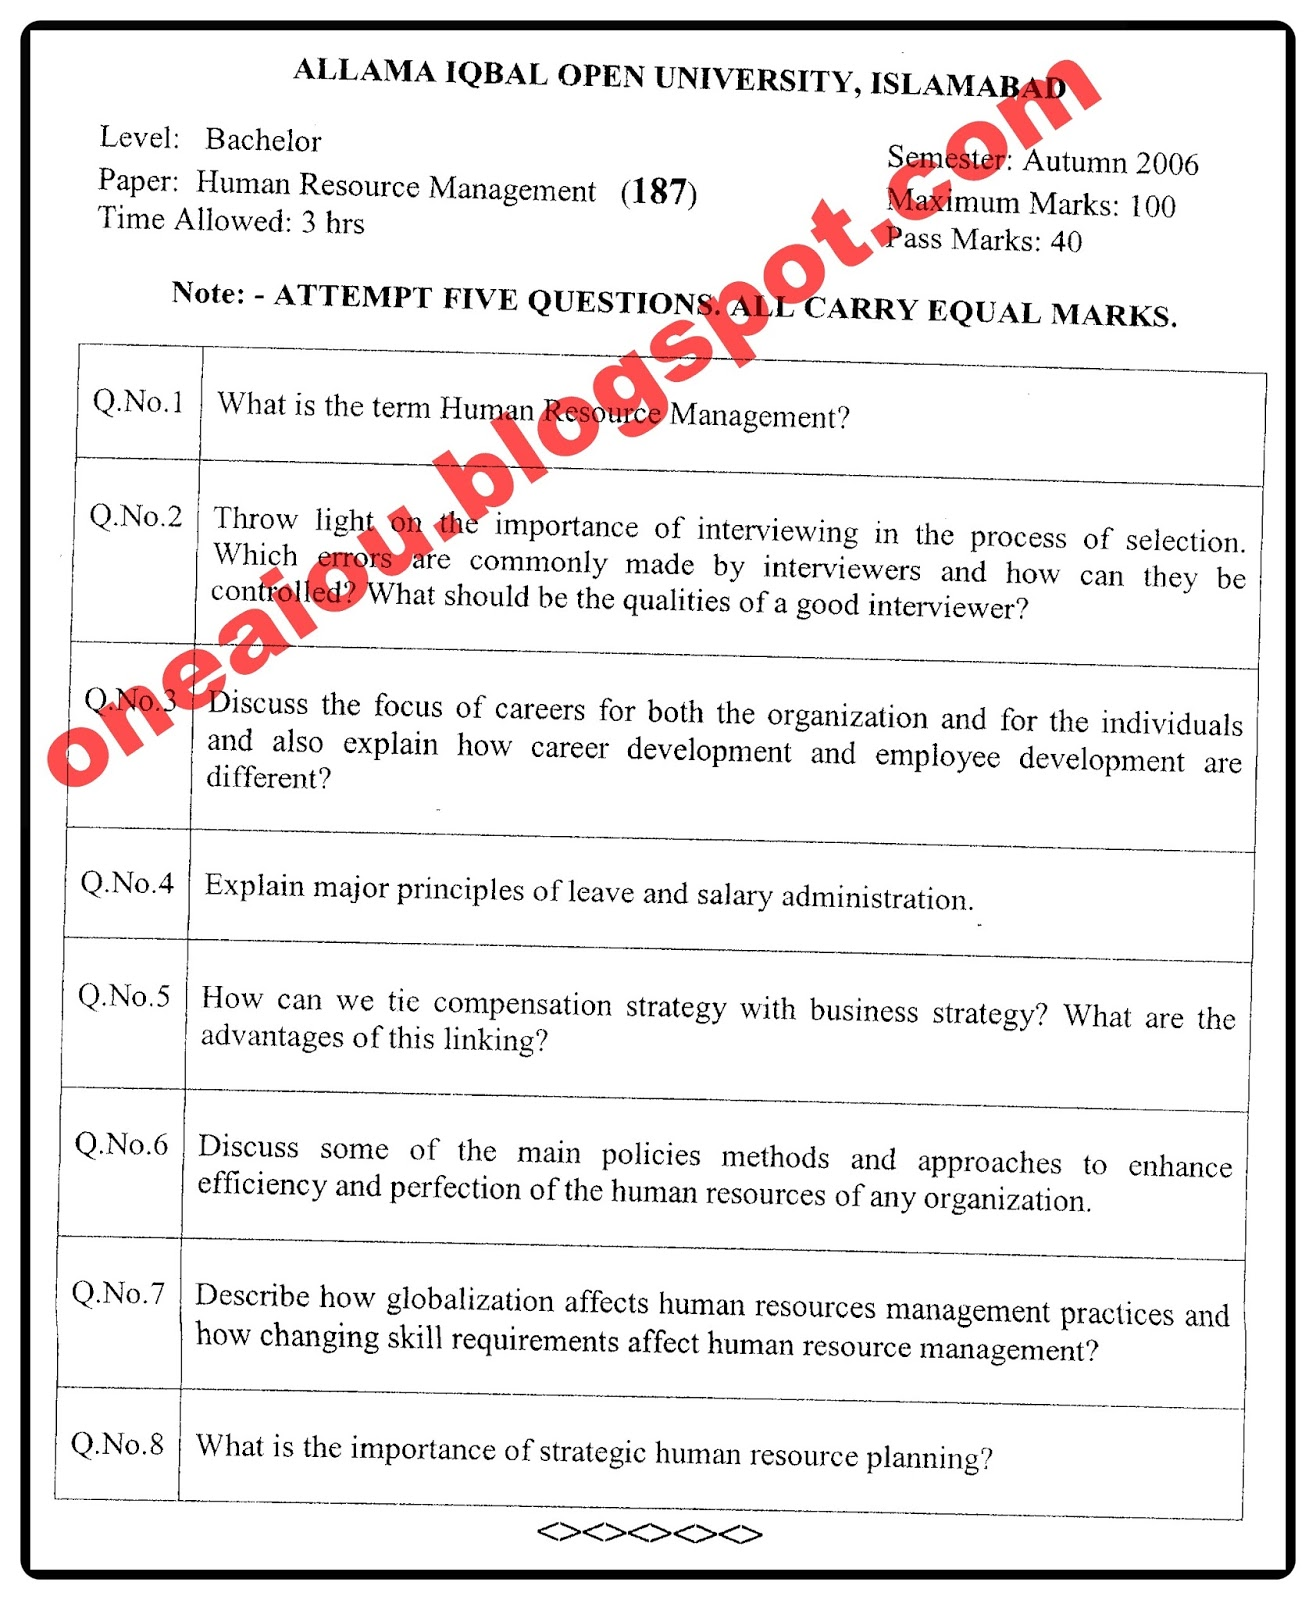 Allama Iqbal Open University Islamabad - aiou pk: AIOU B A